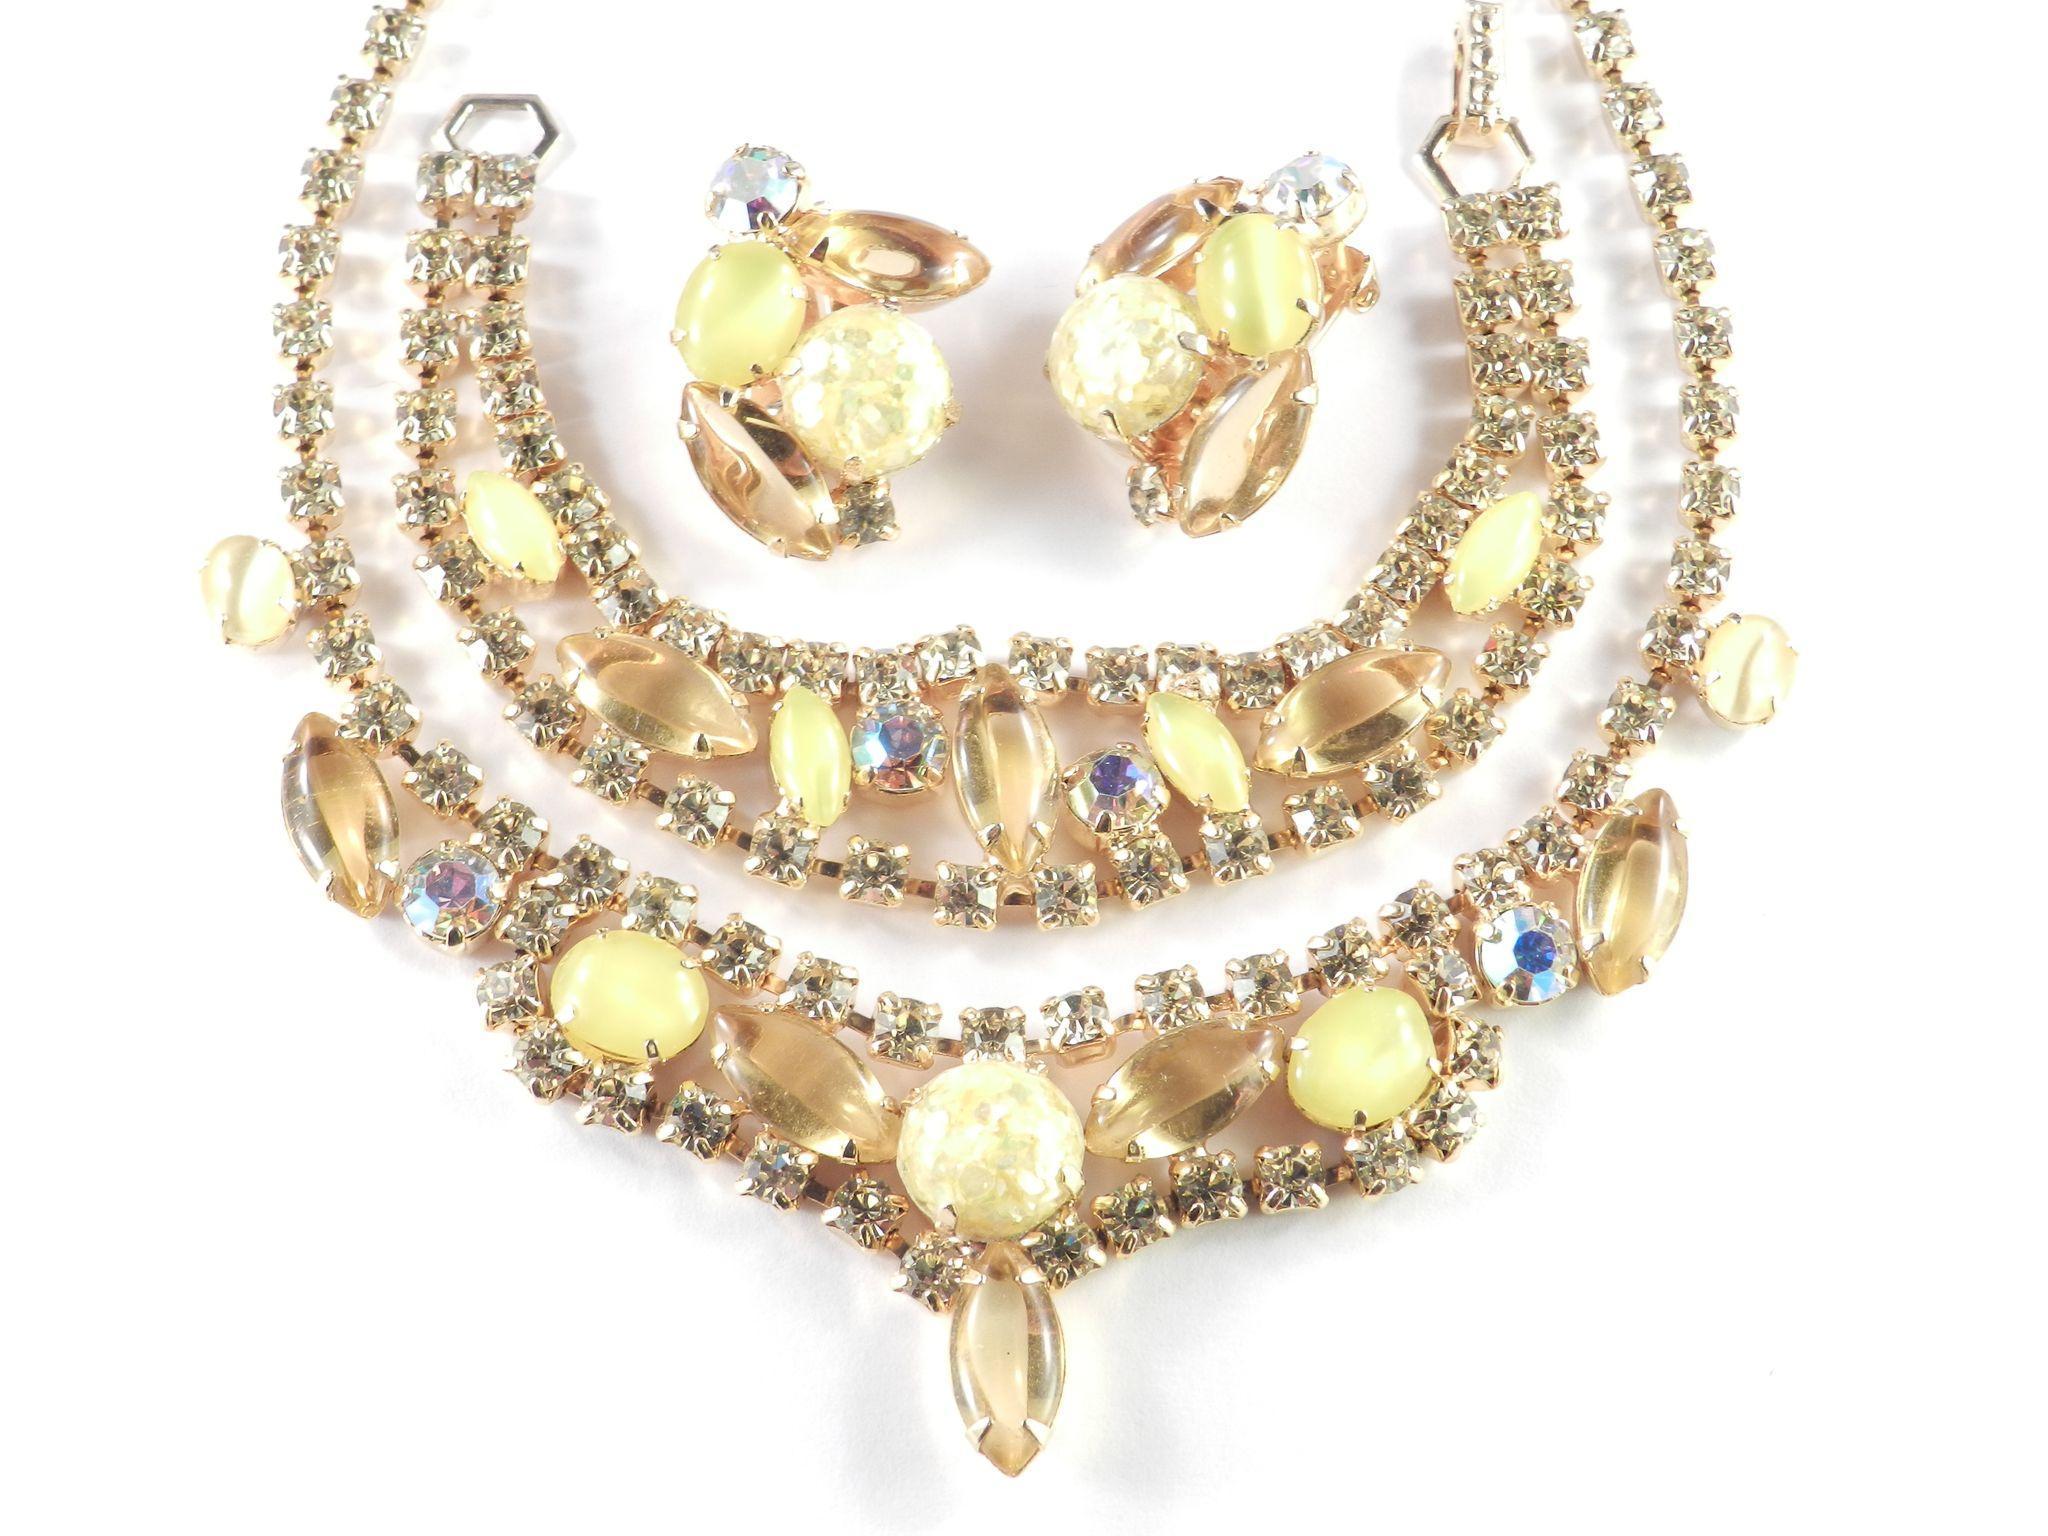 Rhinestone Art Glass Confetti Lucite Necklace Bracelet Earrings Set Parure